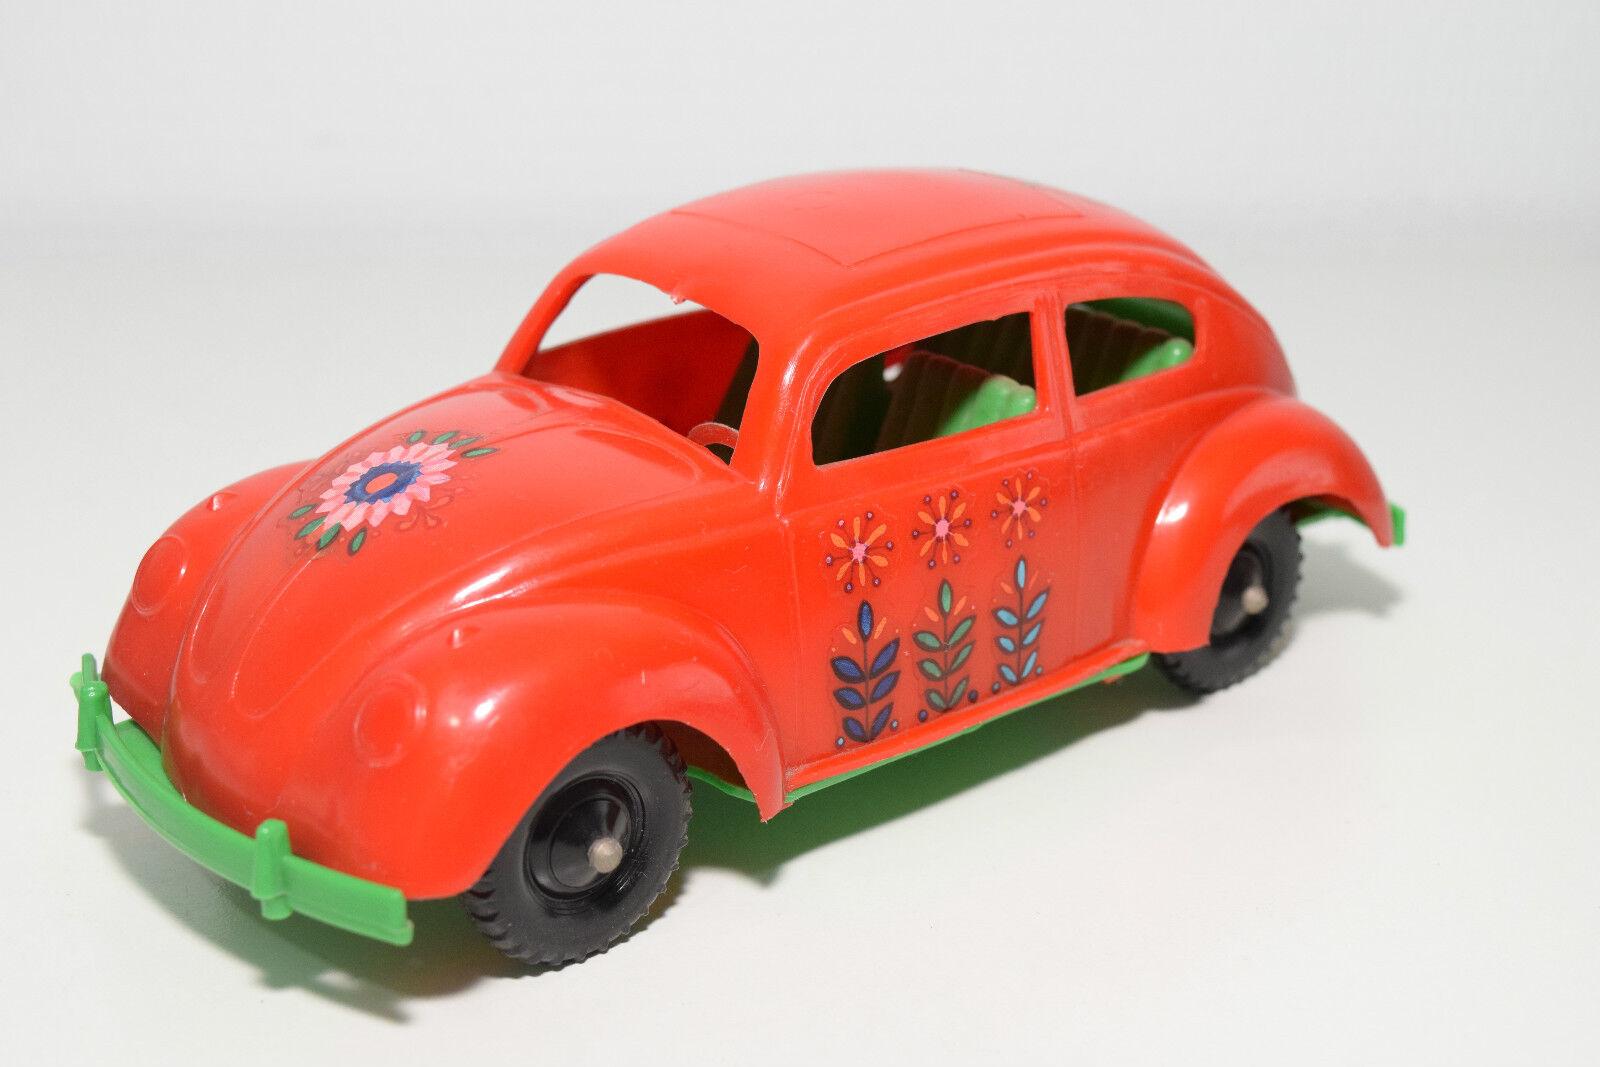 USA OR GERMANY PLASTIC PLASTIK VW VOLKSWAGEN BEETLE KAFER FLOWER POWER NEAR MINT